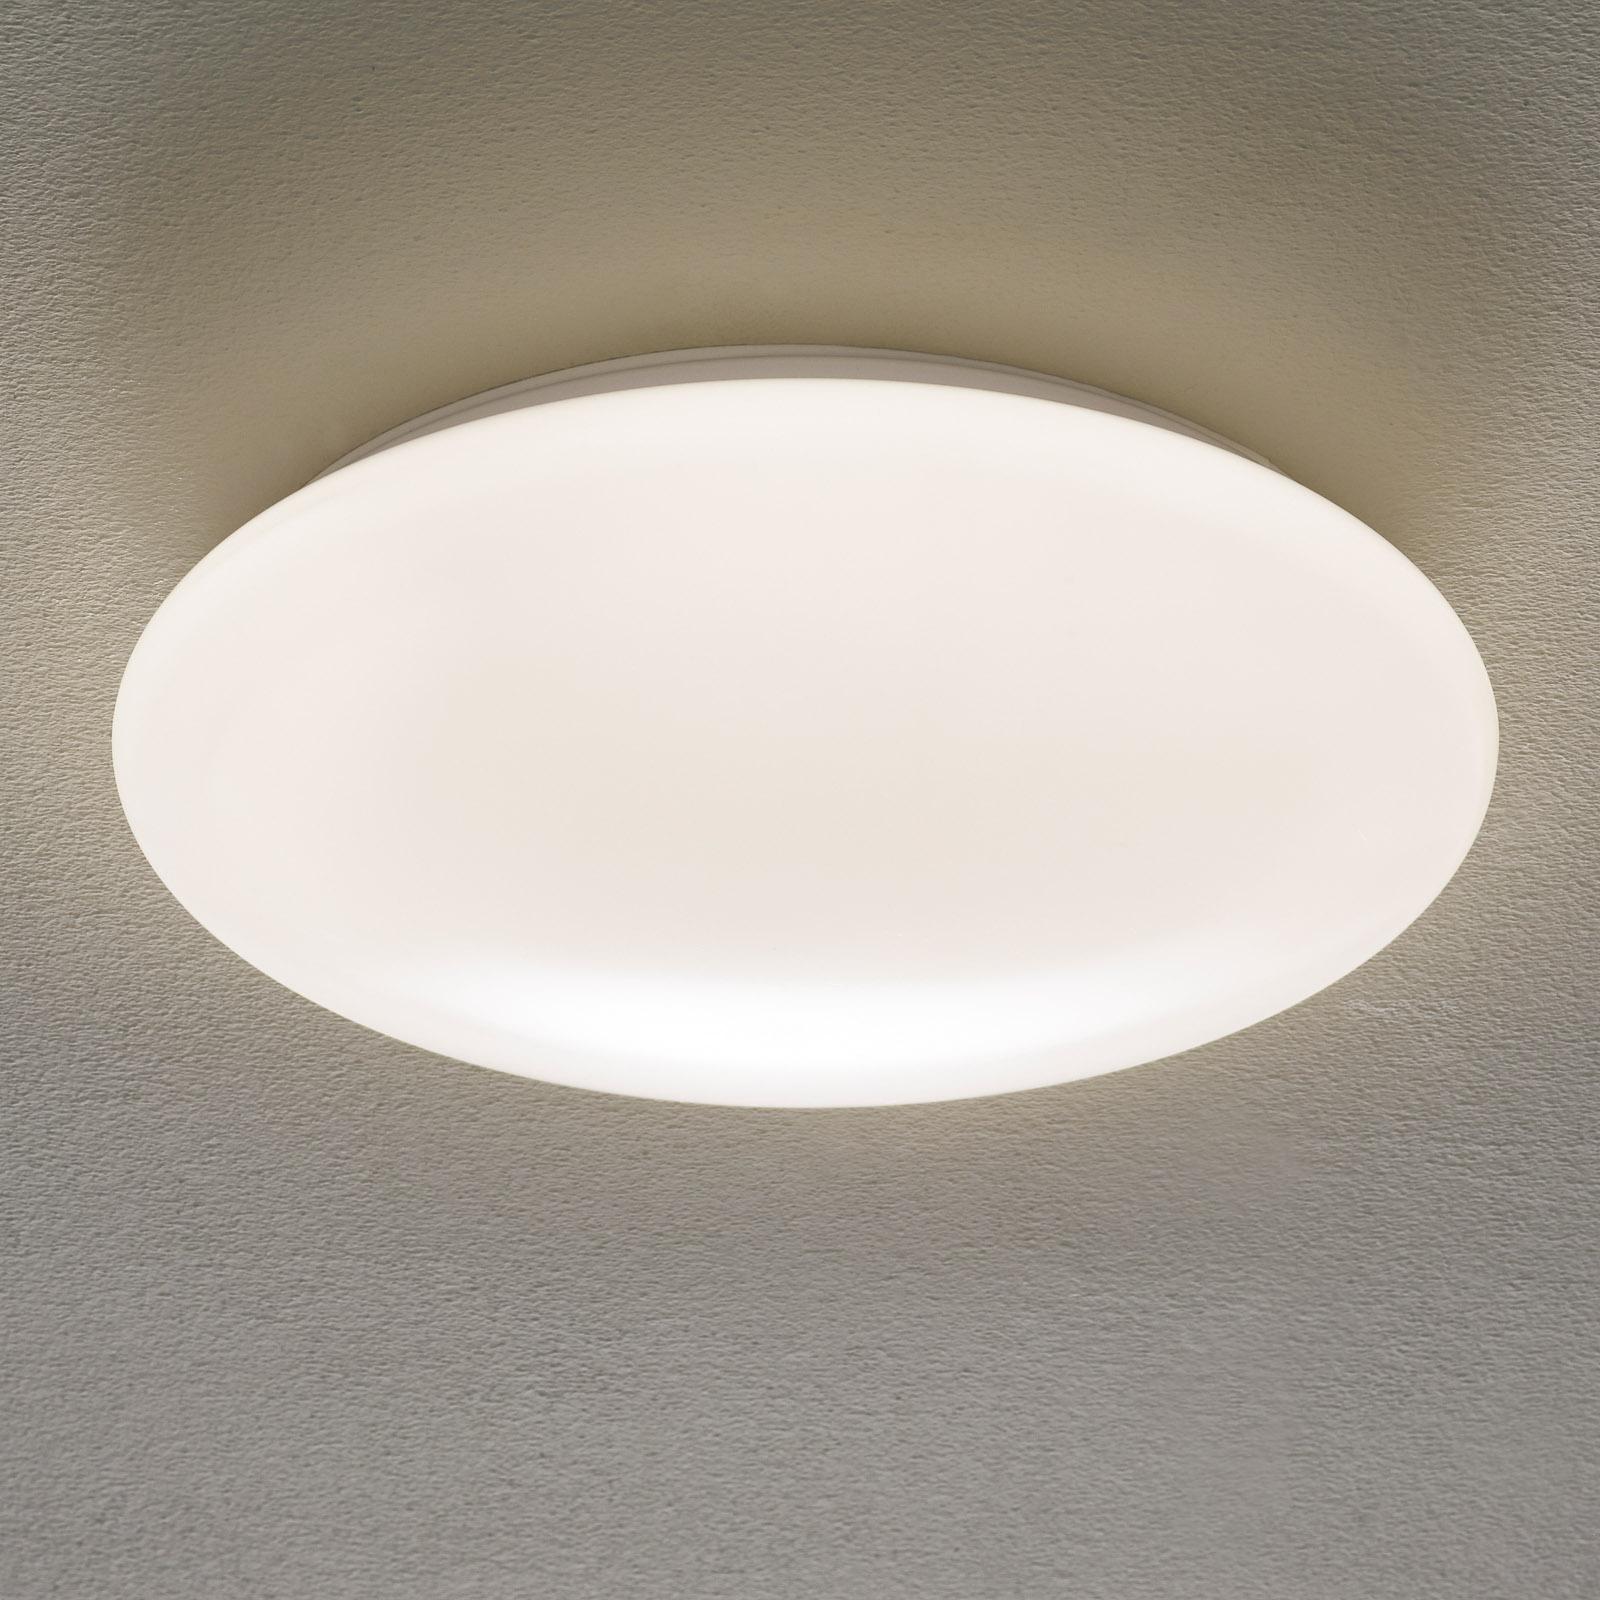 LED-kattovalo Altona MN3 perusvalkoinen Ø 32,8 cm